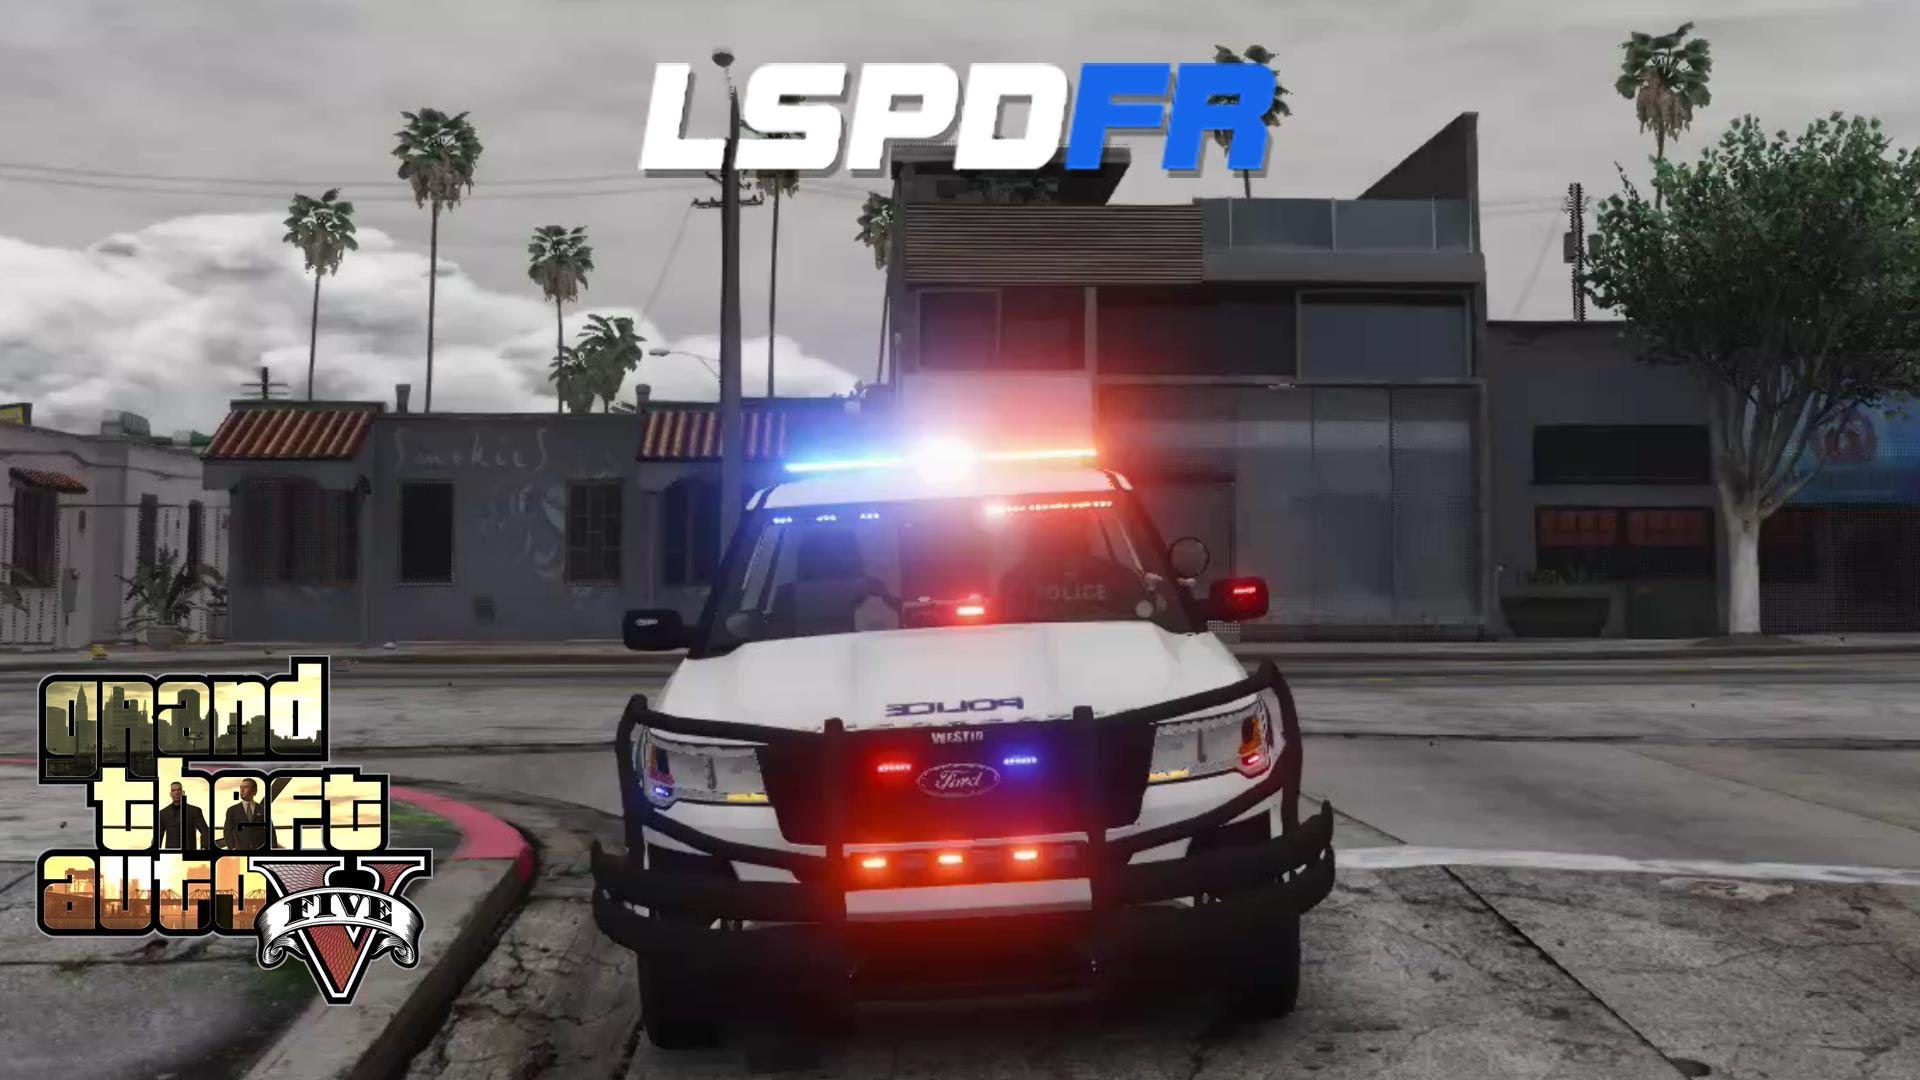 Unmarked police car gta 5 - Gta 5 Lspdffr Police Mod Supervisor Patrol